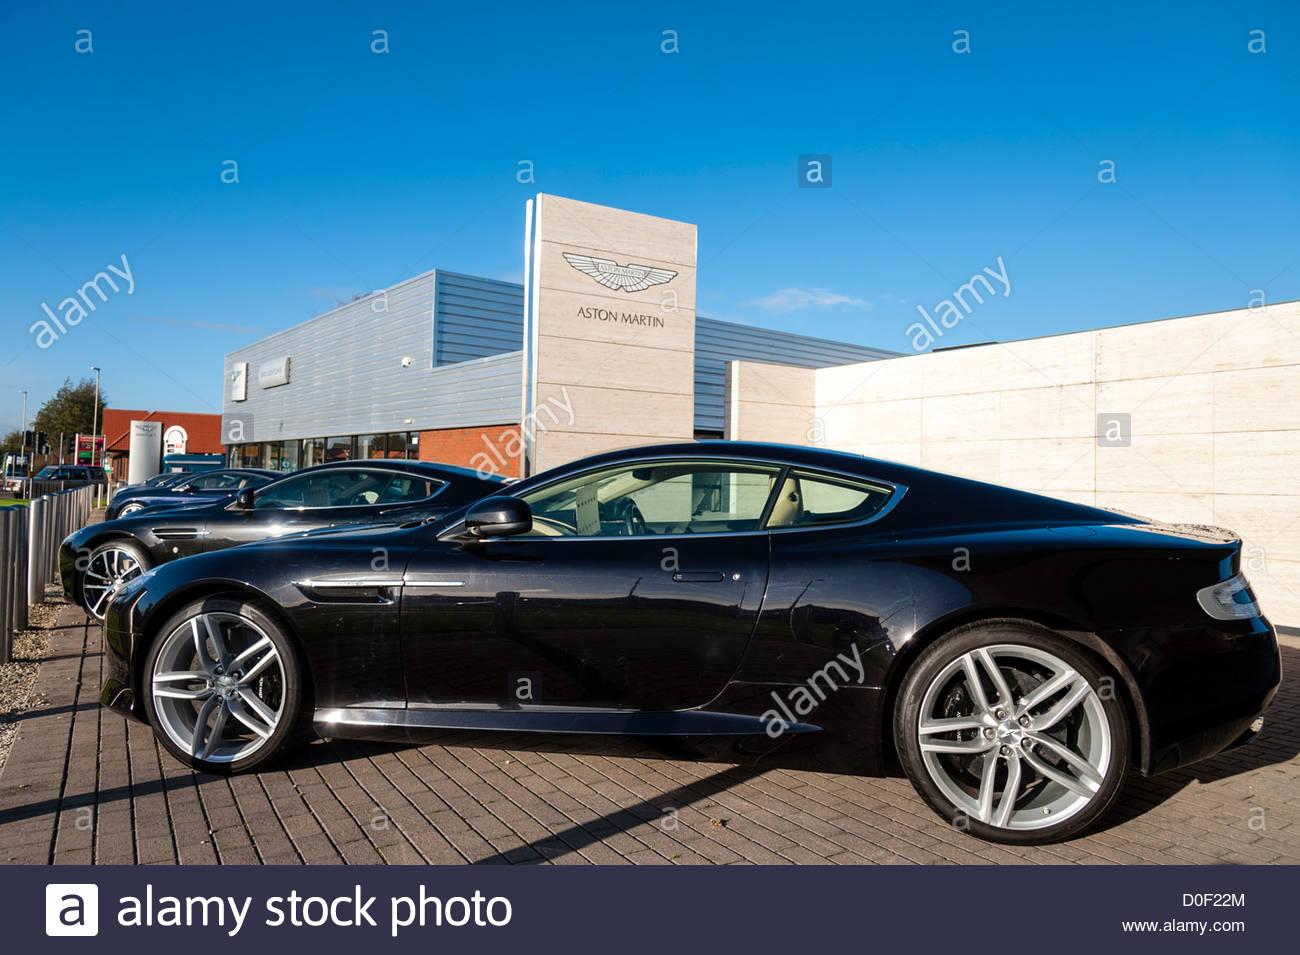 Aston Martin Dealership Stock Photos  U0026 Aston Martin